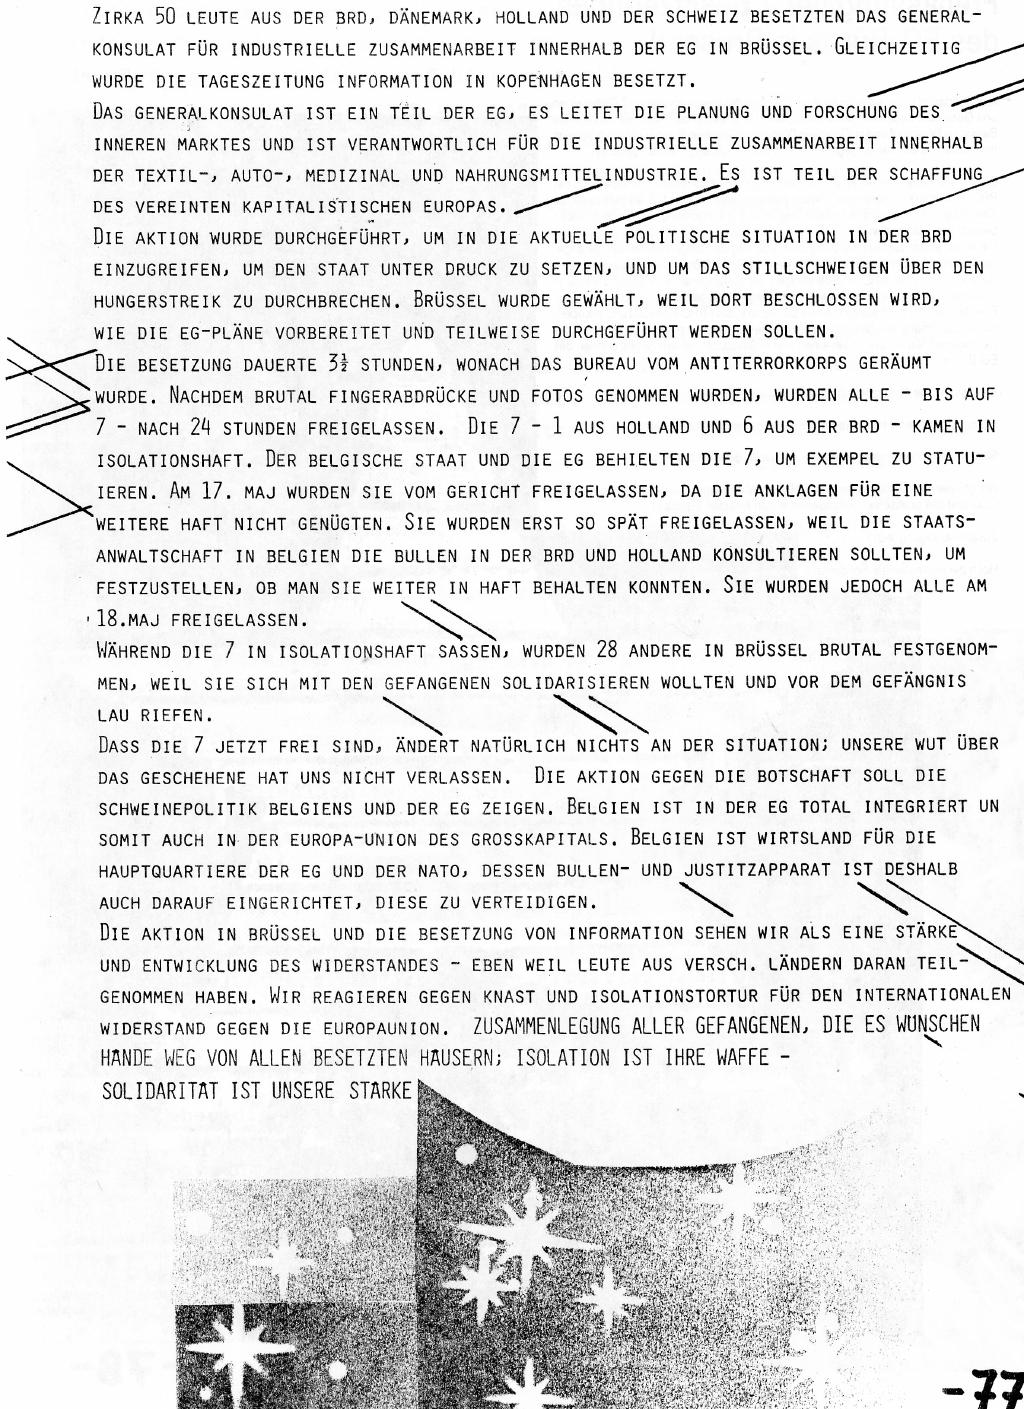 Belgien_Doku_Besetzung_EG_Kommission_1989_079